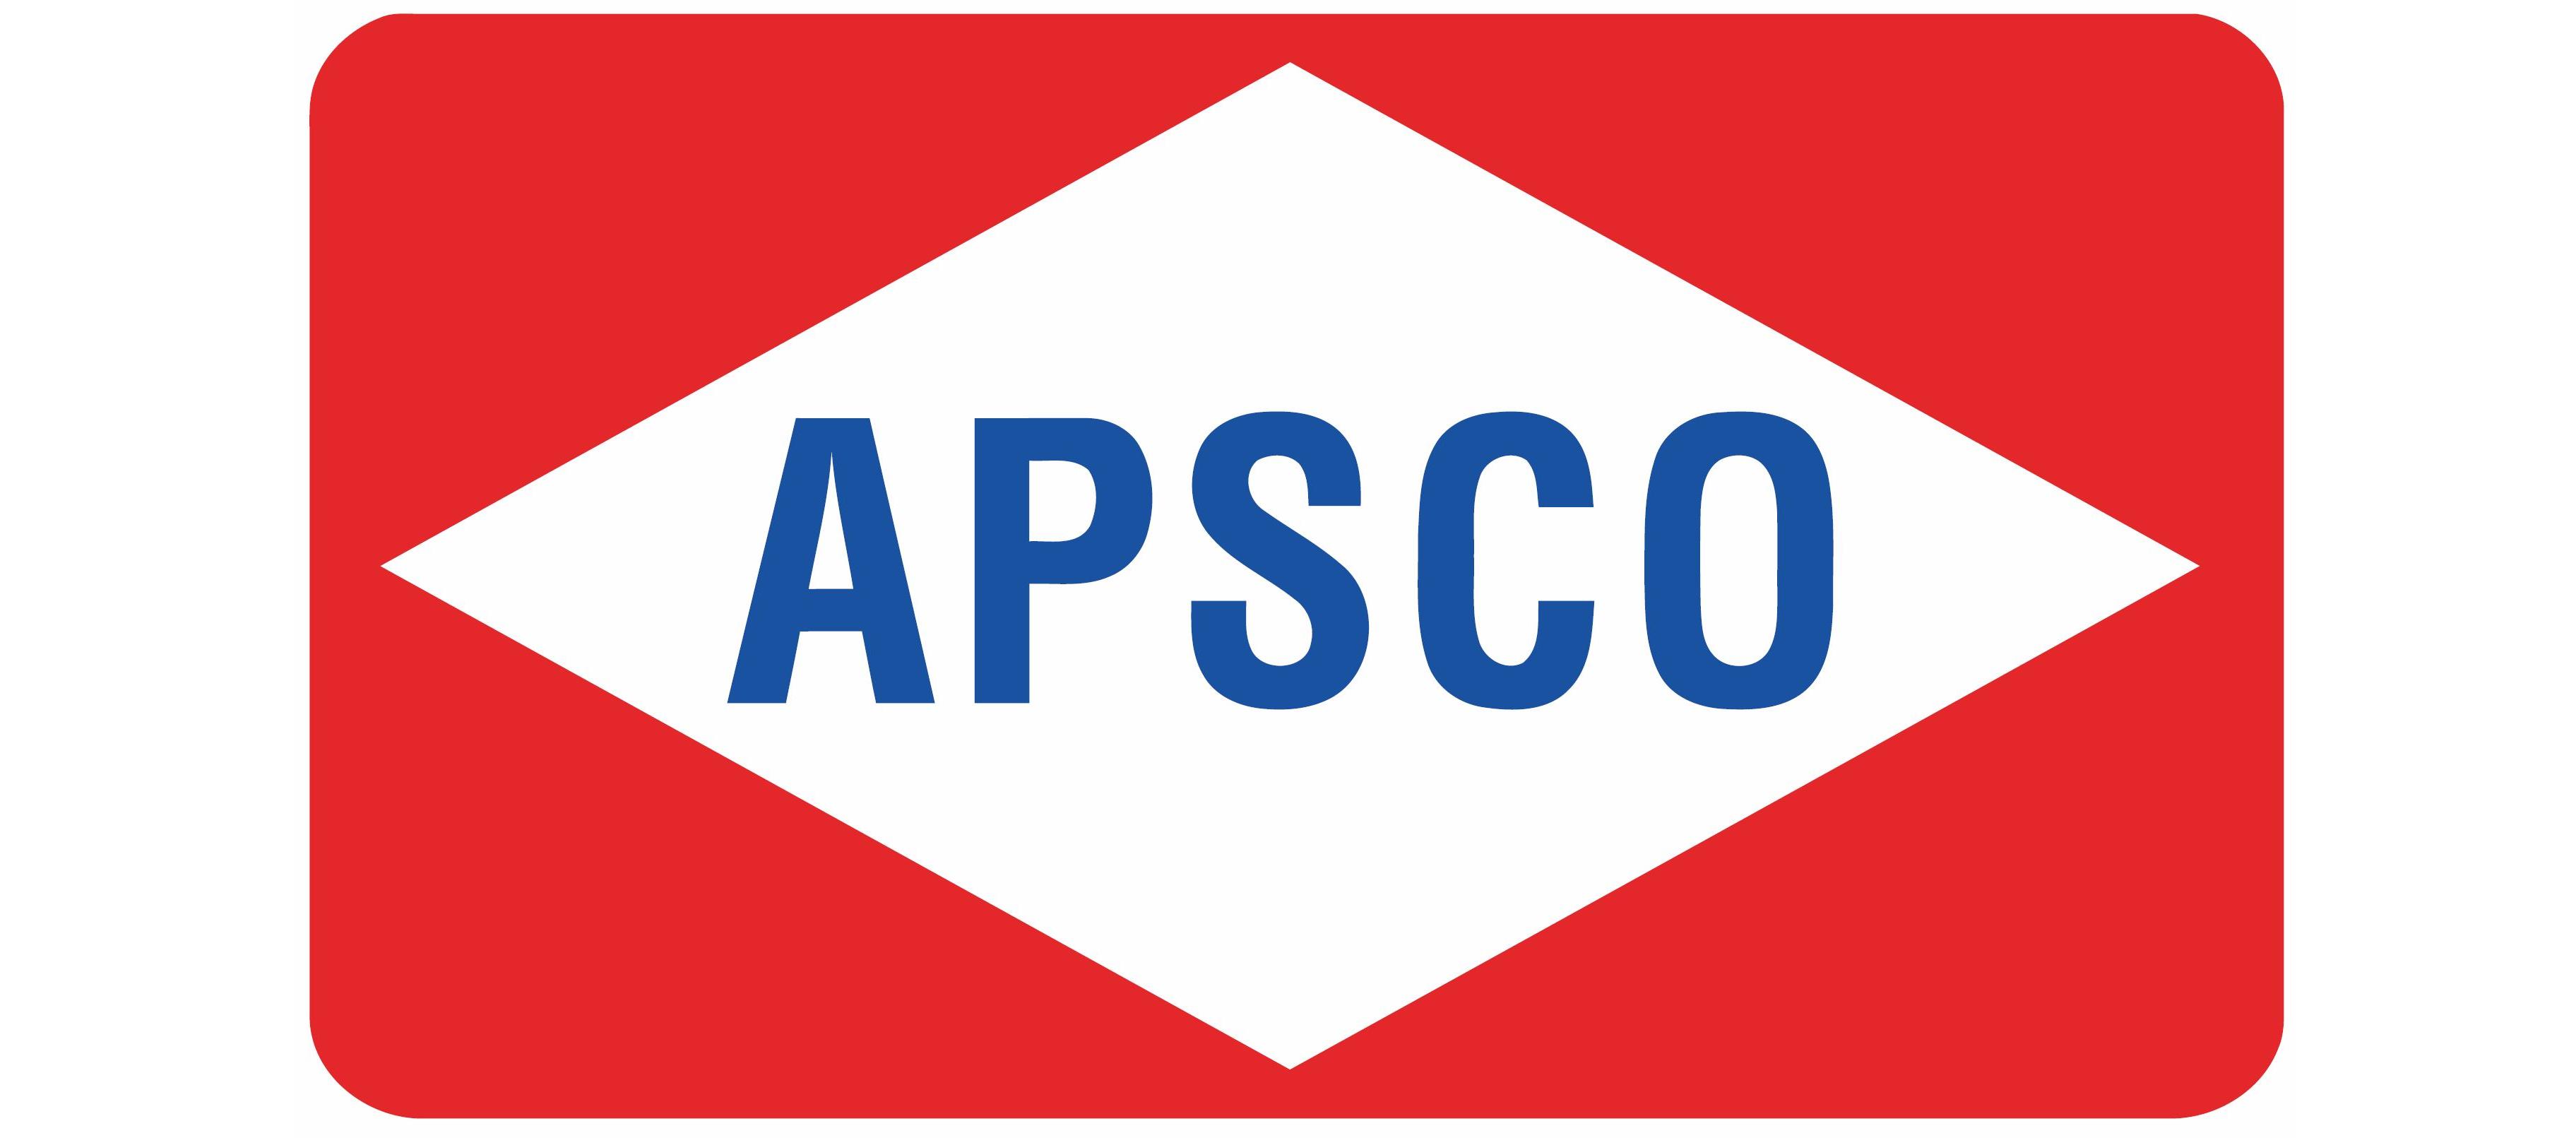 Arabian Petroleum Supply Company